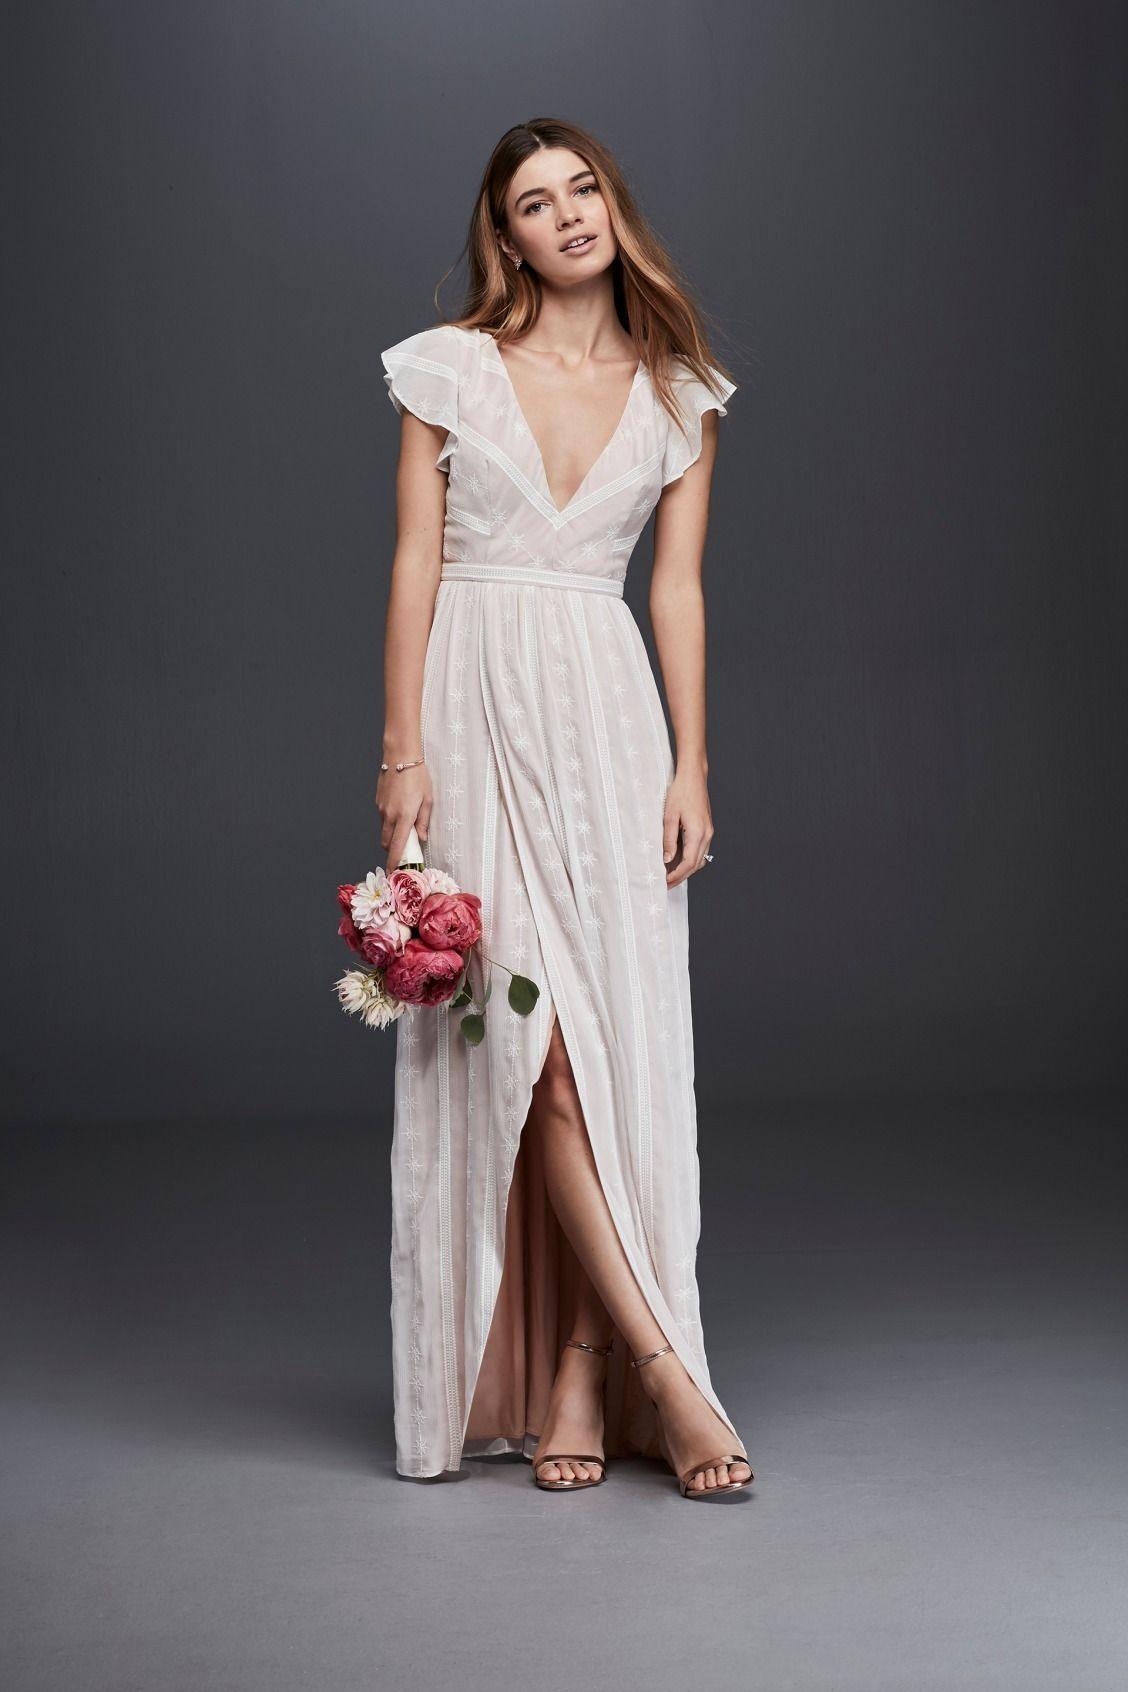 Embroidered Chiffon Dress With Plunging Neckline David S Bridal Casual Wedding Dress Casual Wedding Backyard Wedding Dresses [ 1692 x 1128 Pixel ]